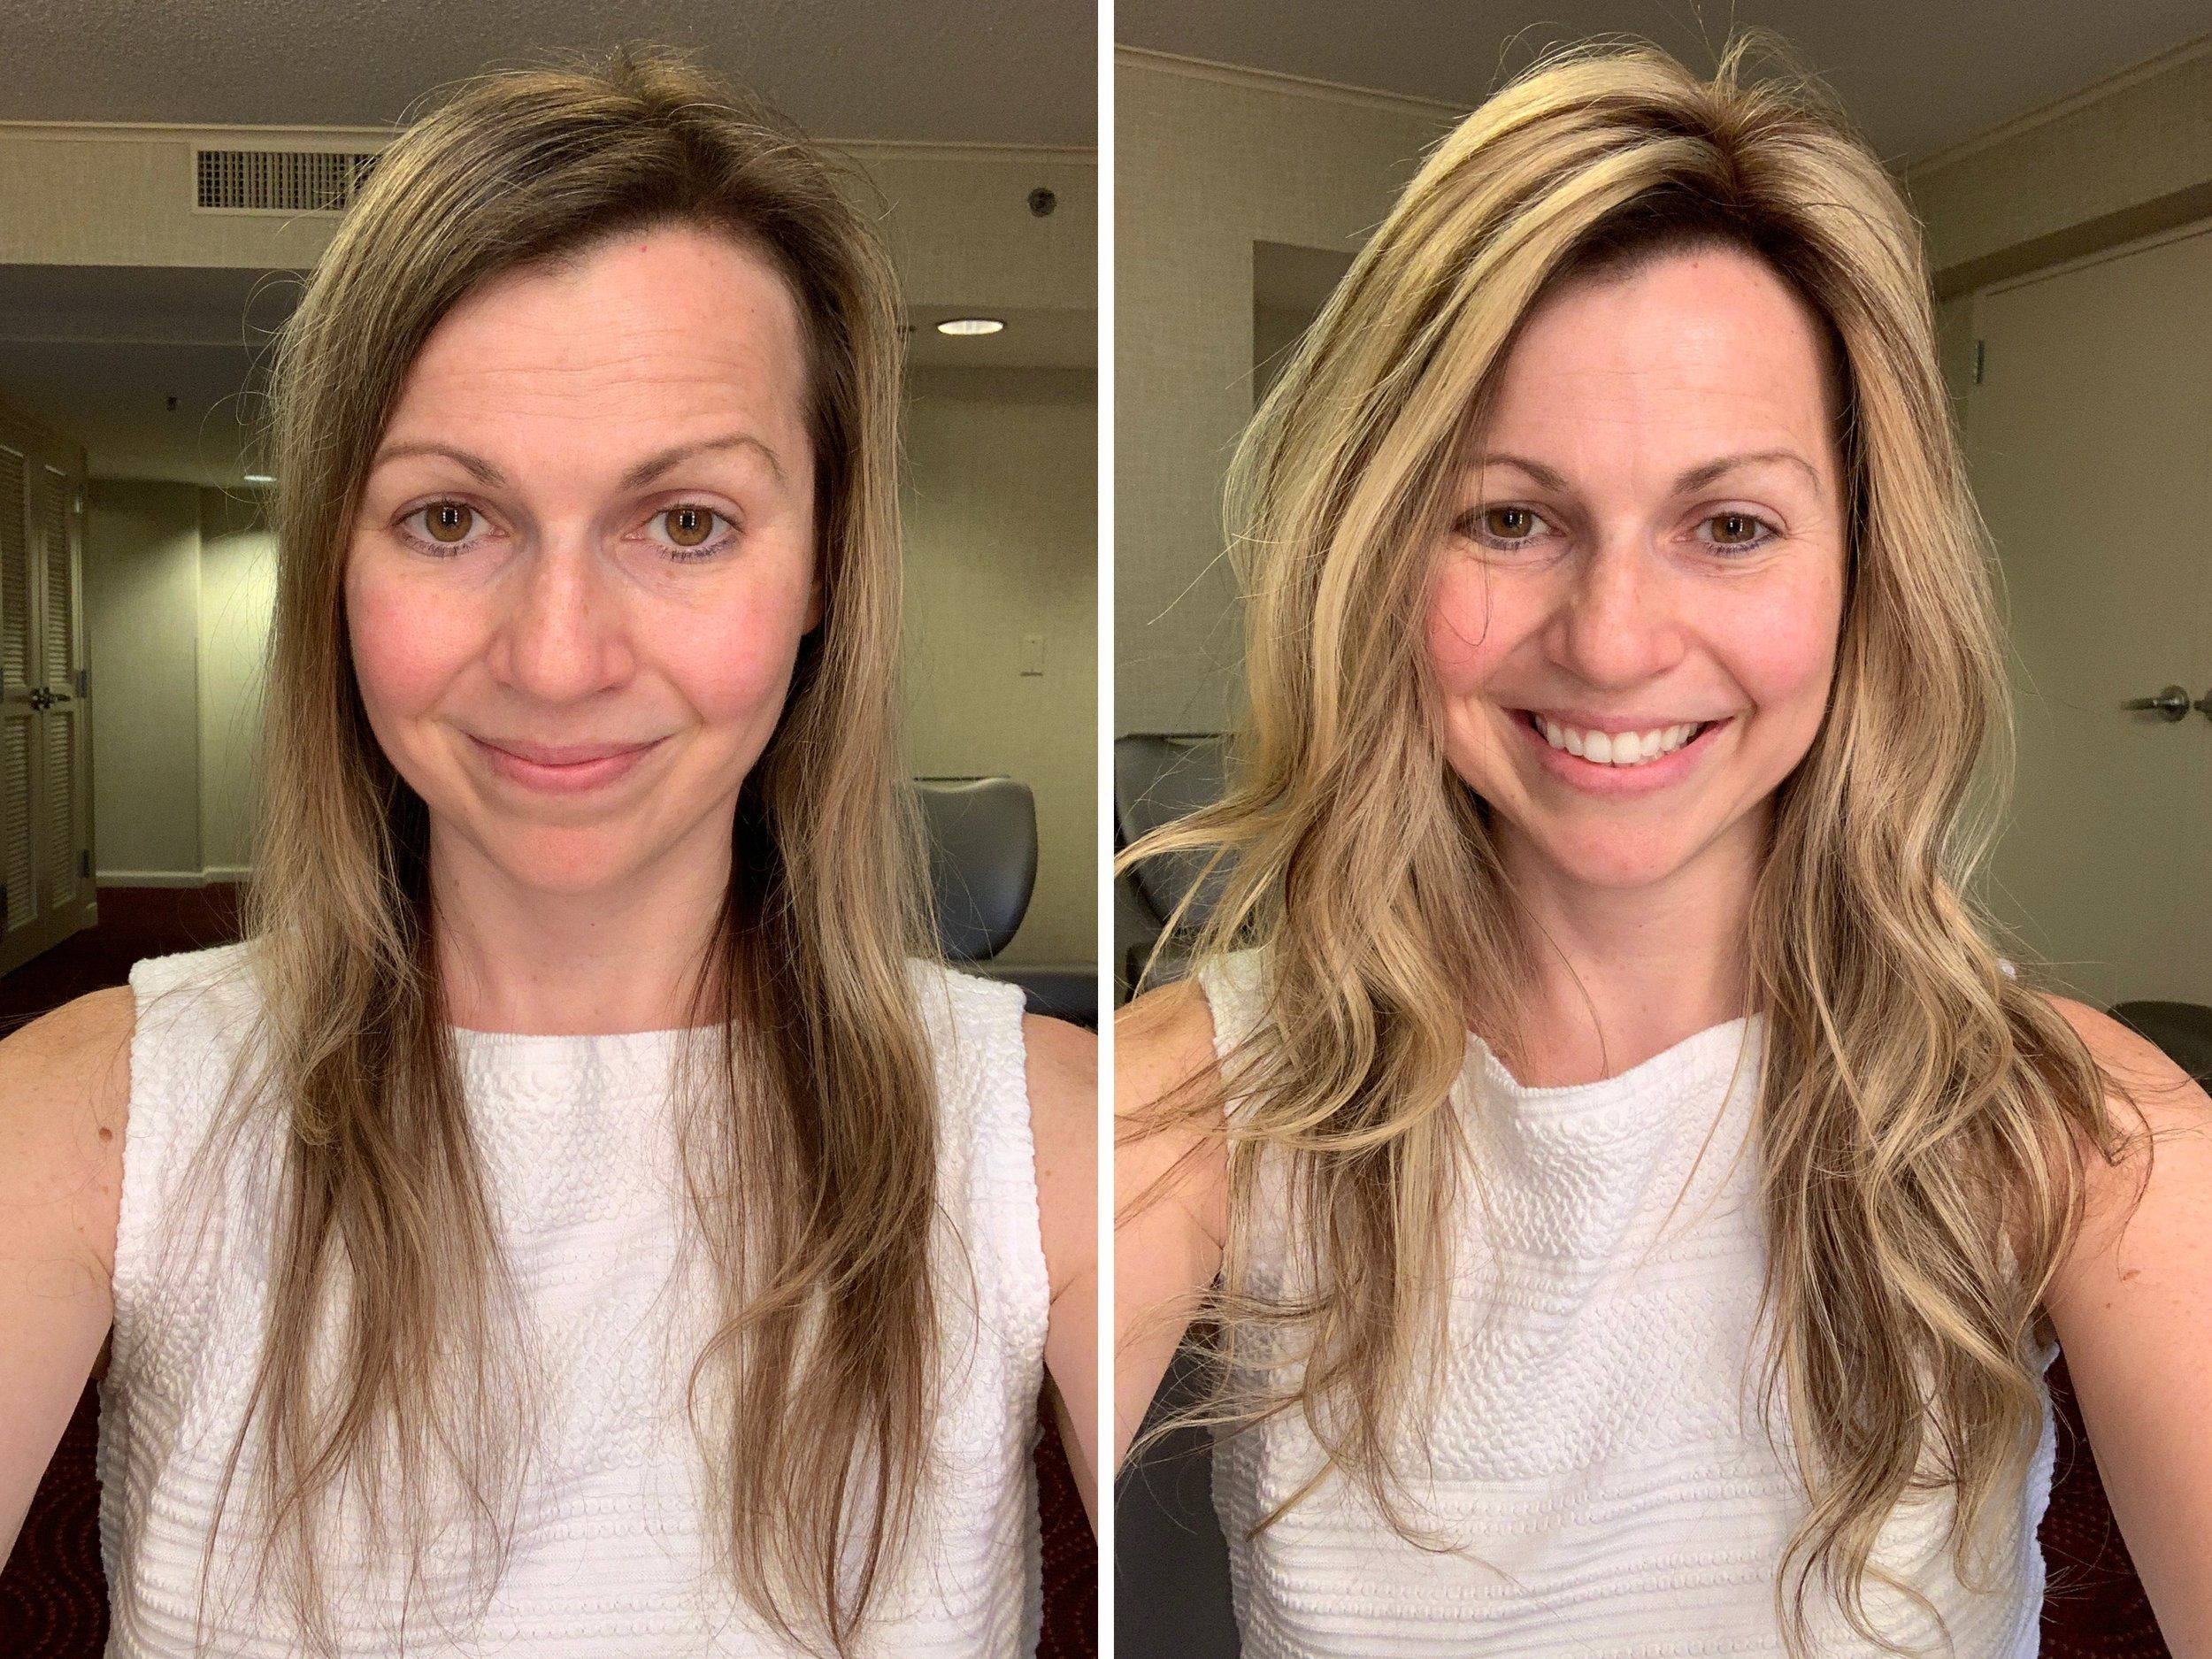 How To Make Thin Hair Look Thicker Thin Hair Styles For Women First Thyme Mom Thin Hair Styles For Women Hairstyles For Thin Hair Extensions For Thin Hair